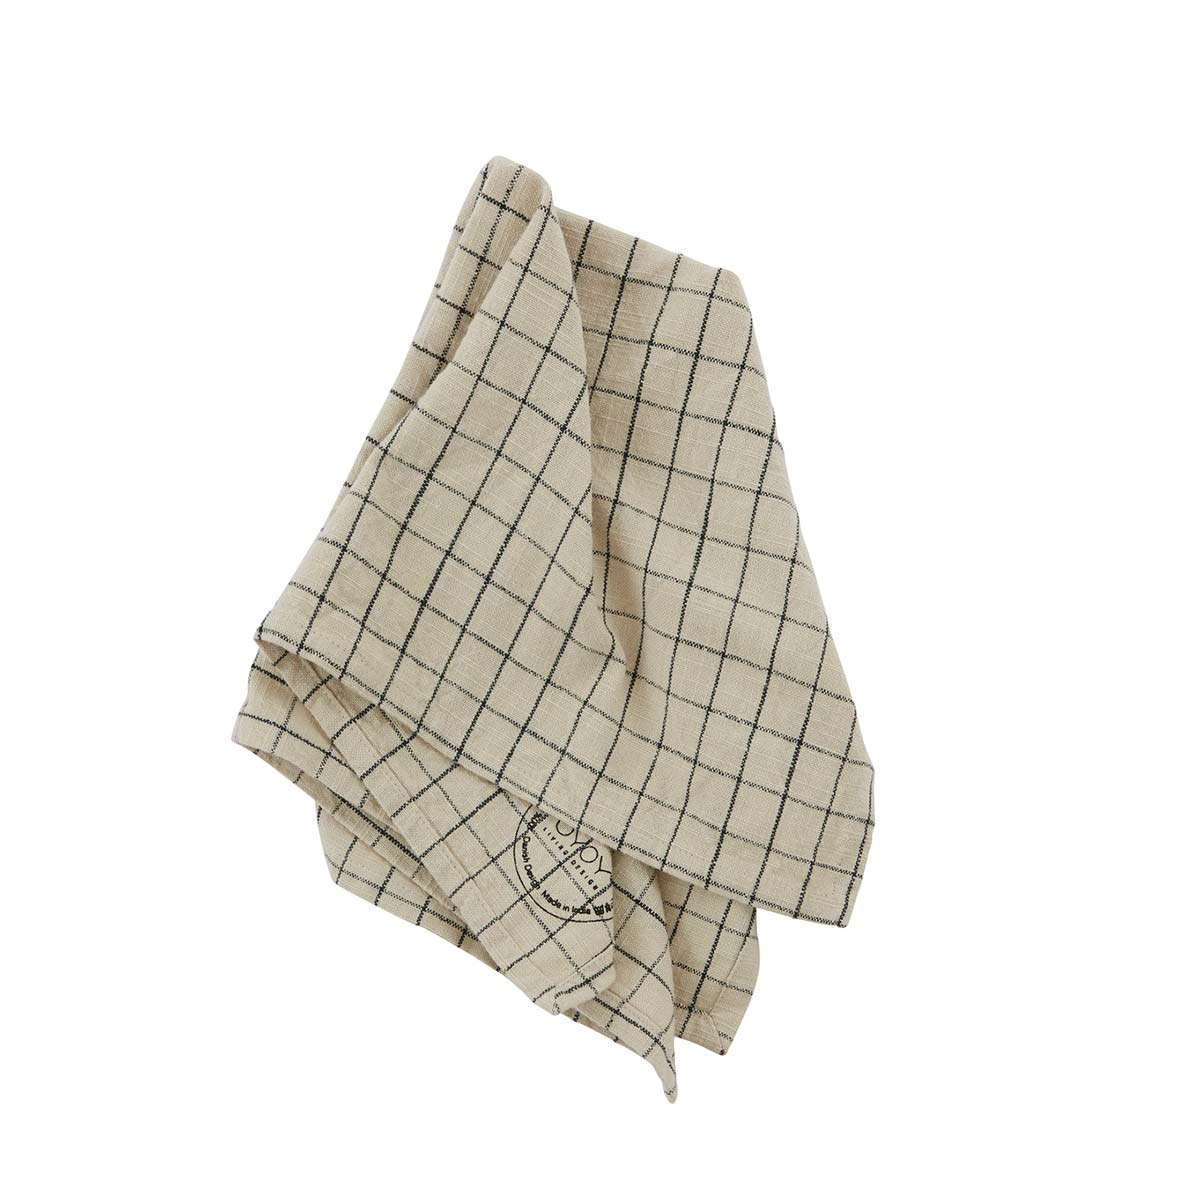 OYOY Grid stofservietter 2 stk. – clay / sort